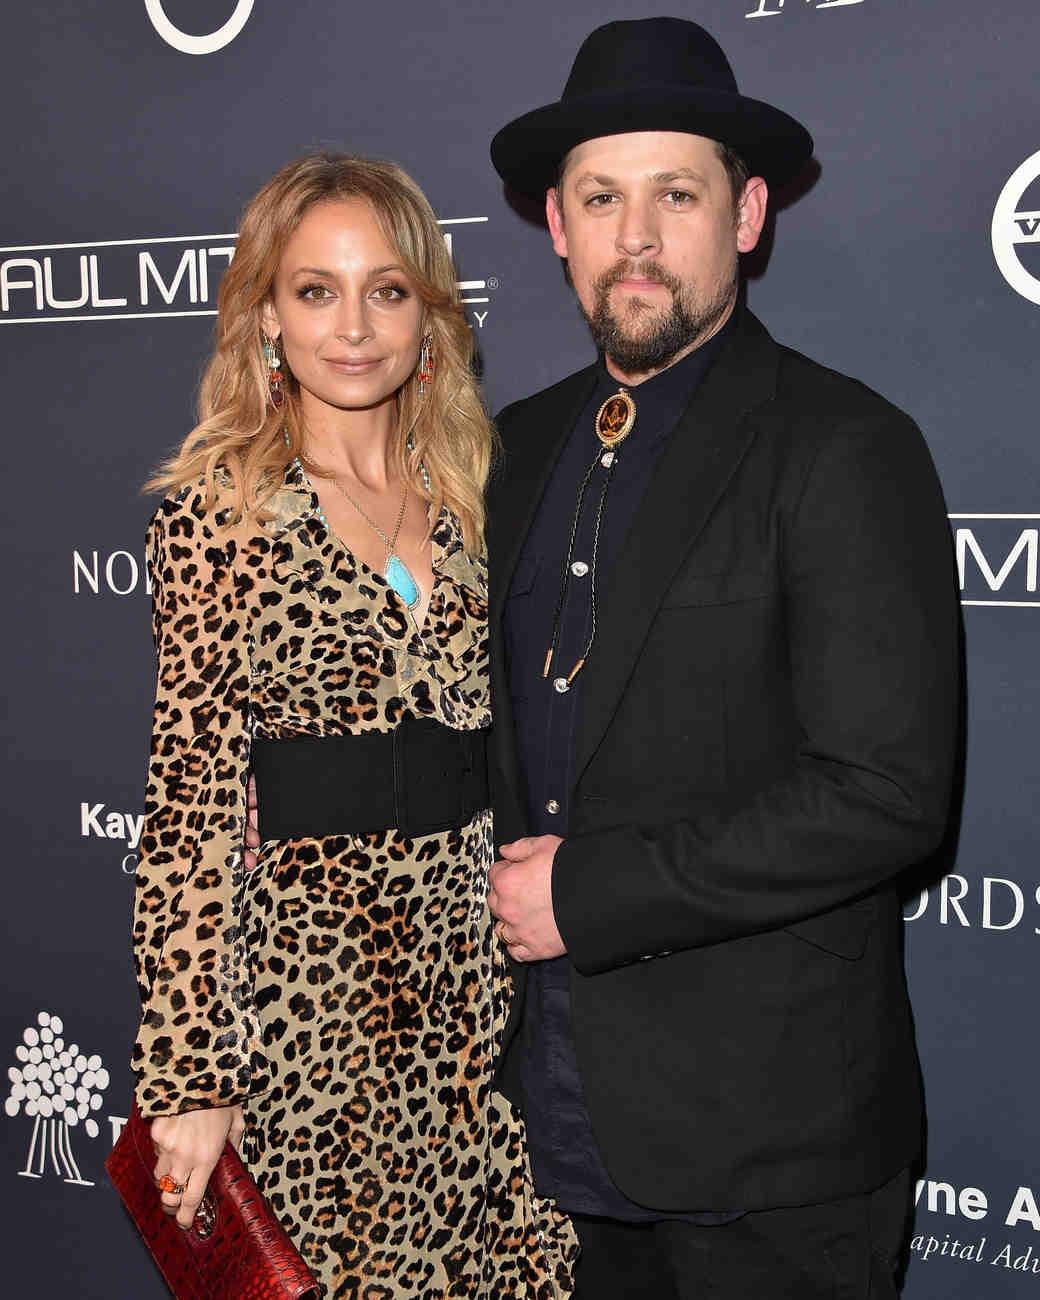 celebrity couple nicole joel black suit leopard print dress